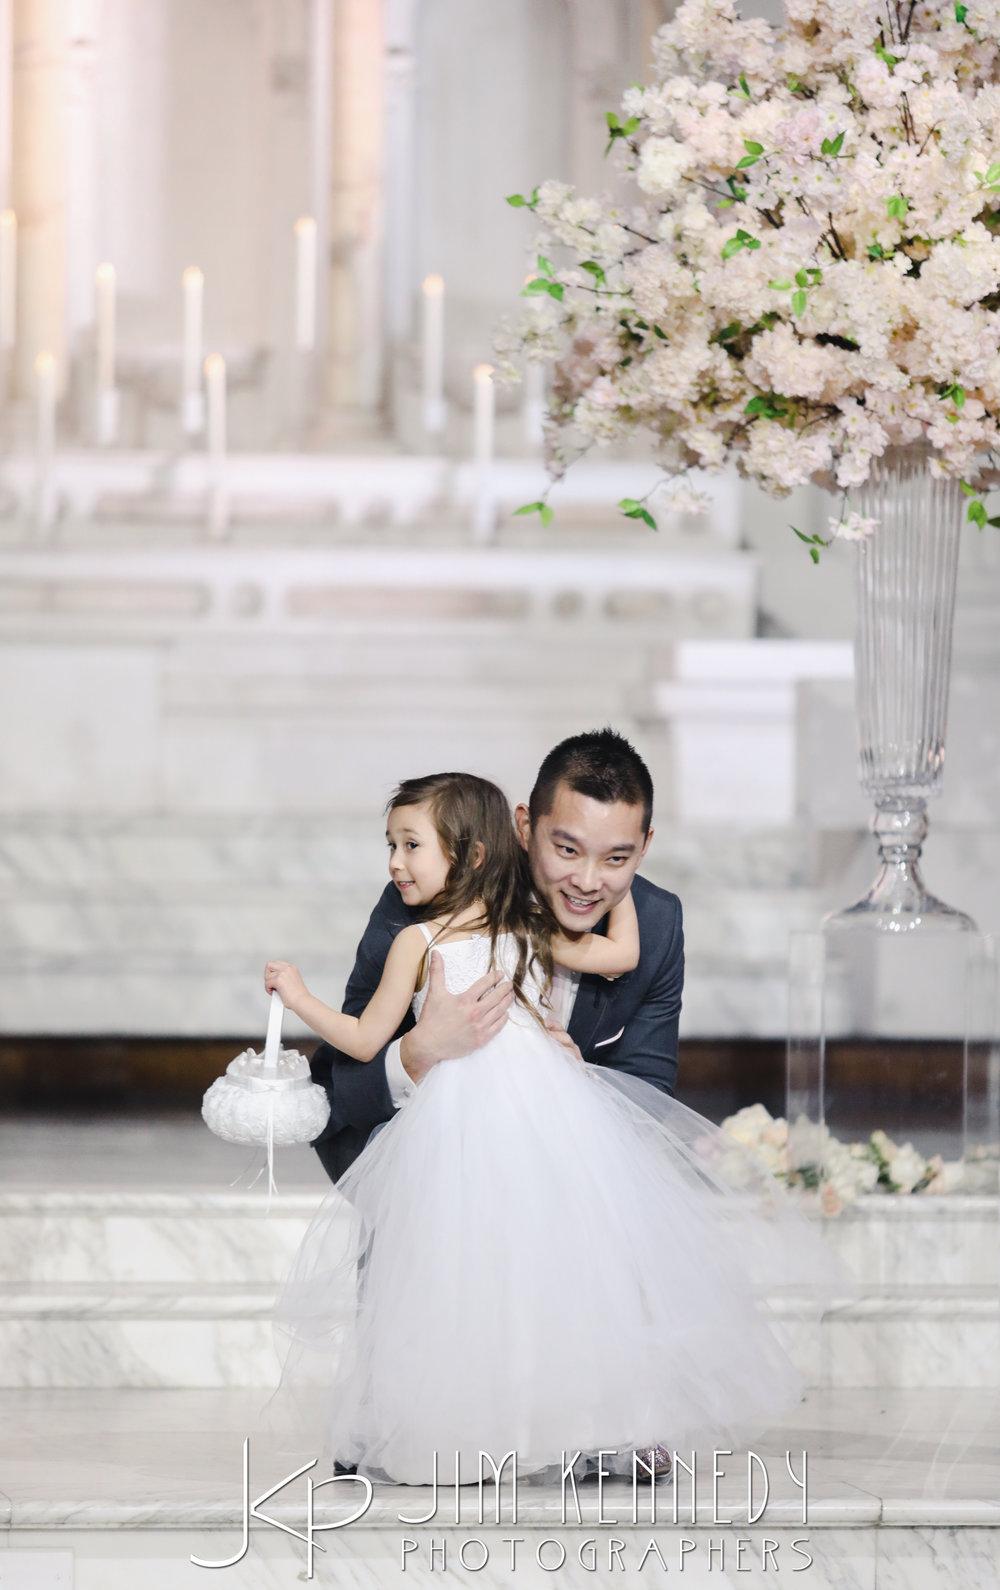 vibian-wedding-los-angeles-katherine-brian_0126.JPG